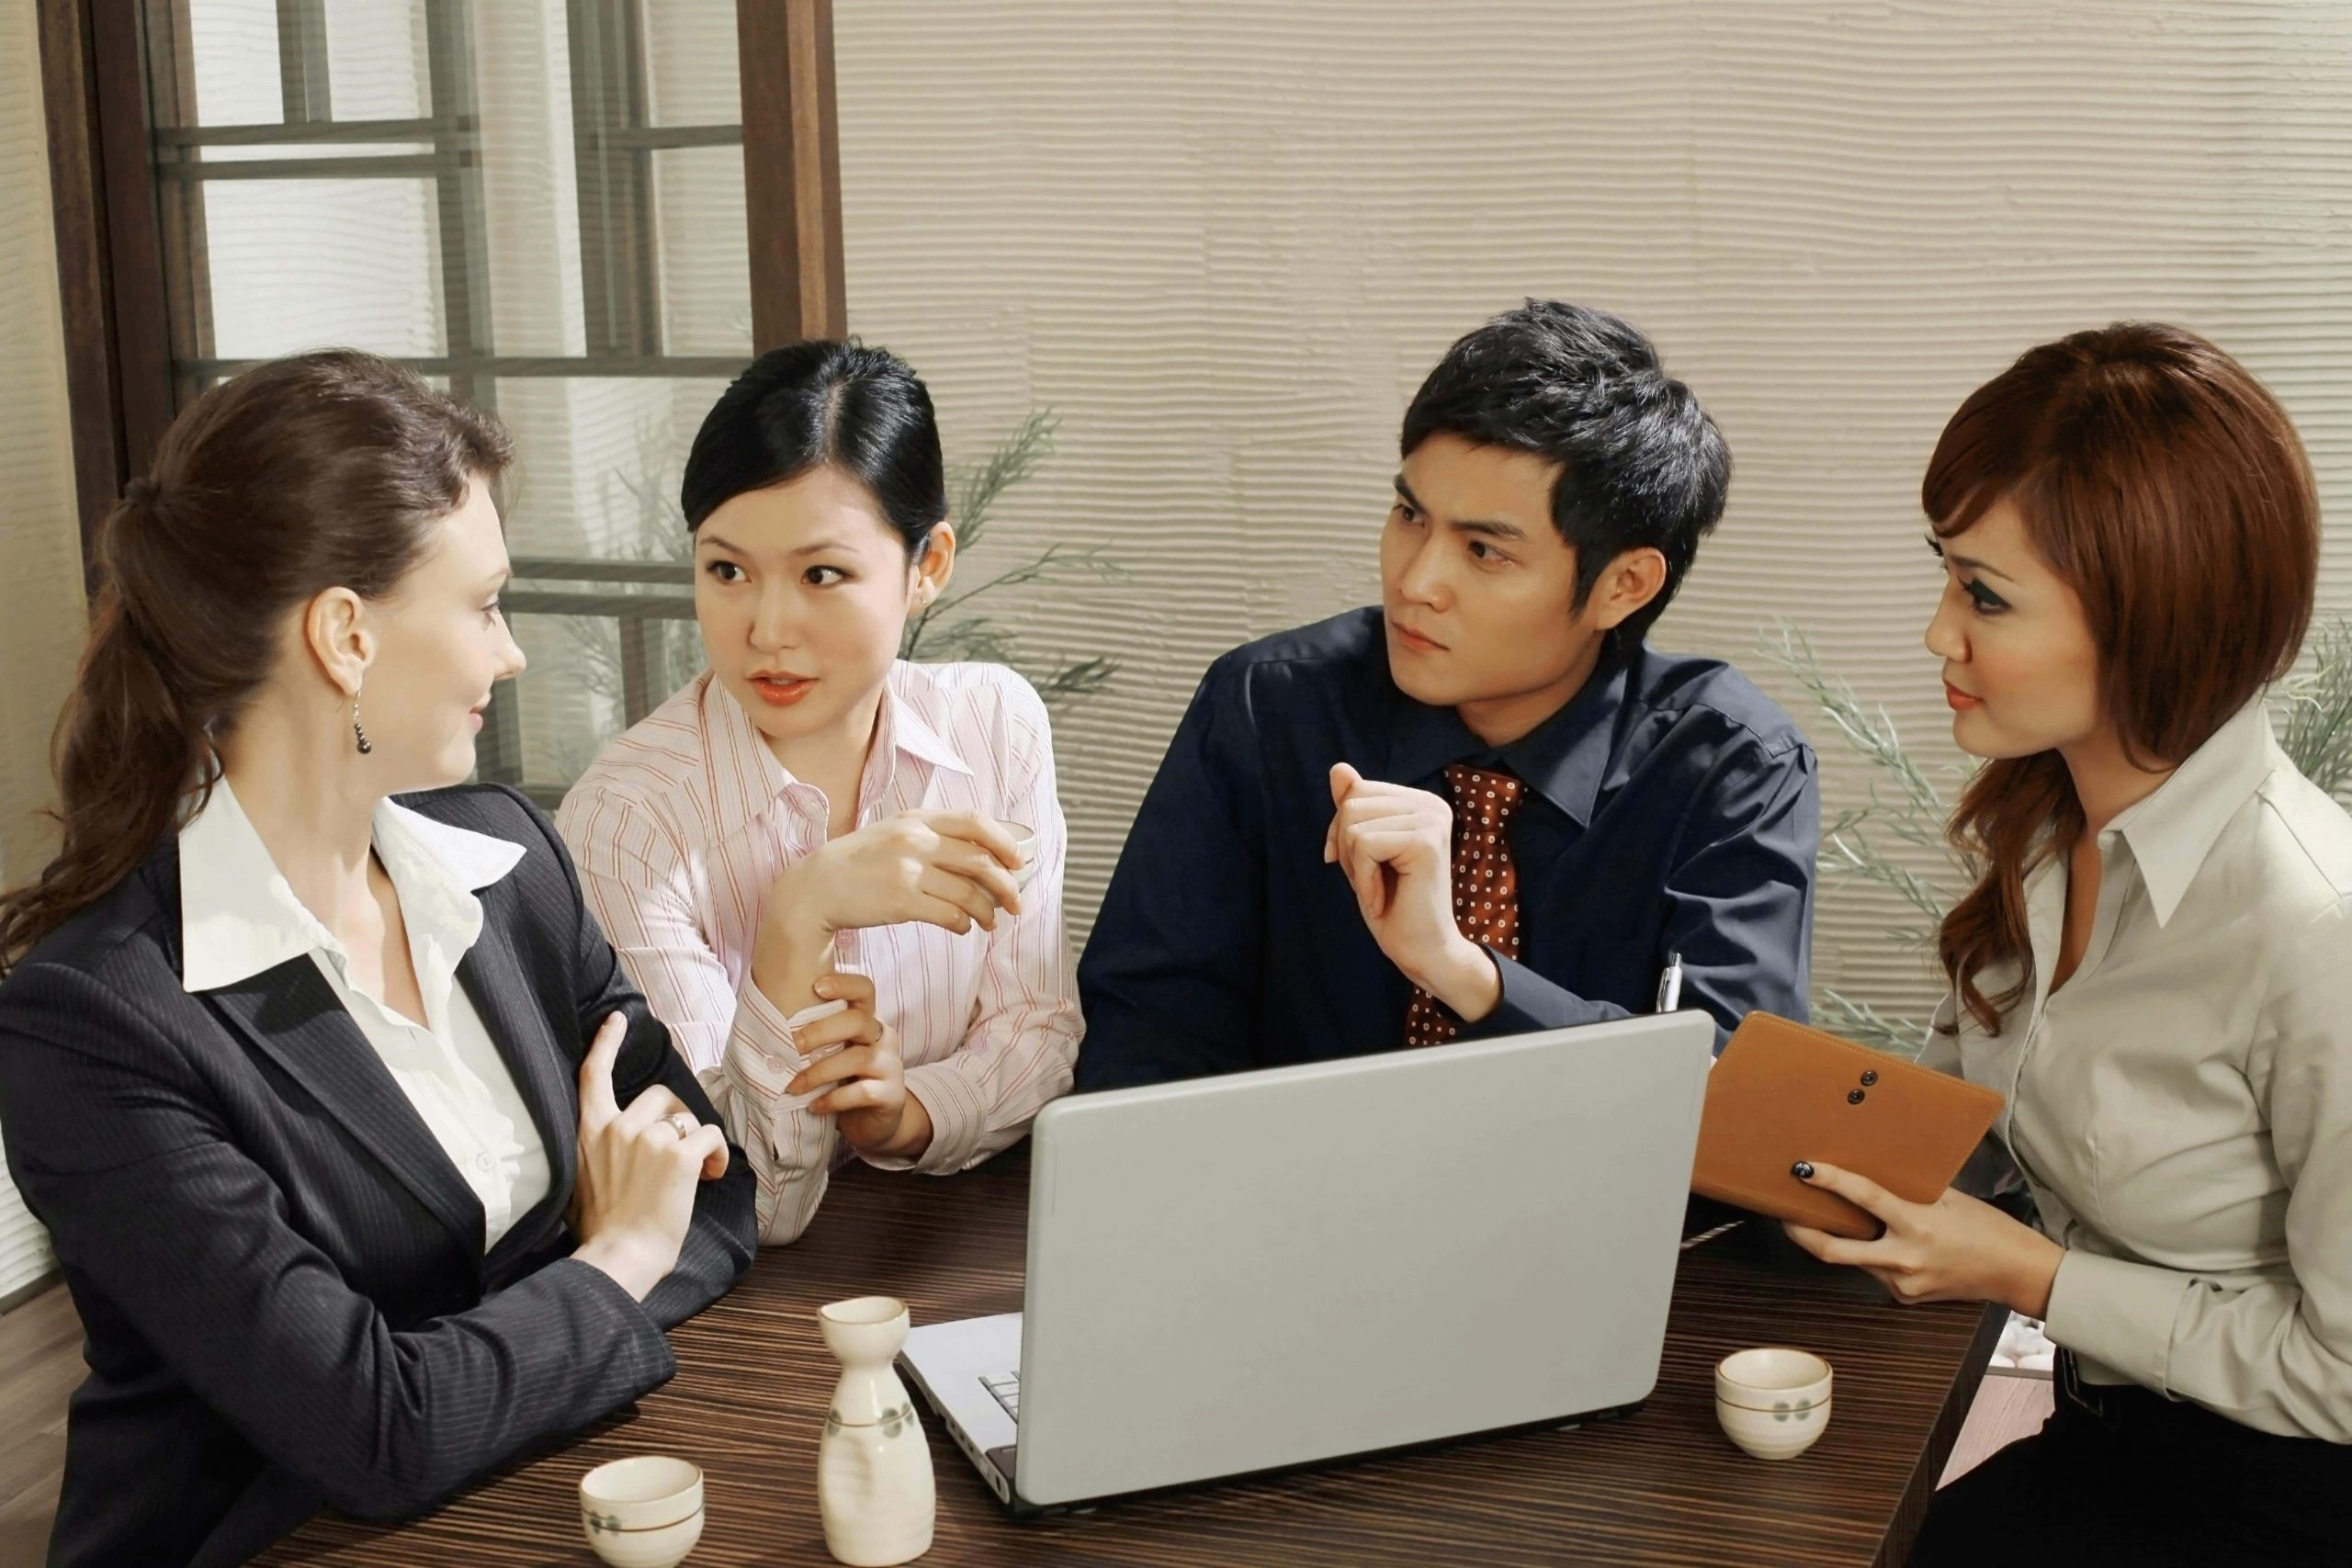 Business_Loan_Moneylender_Singapore